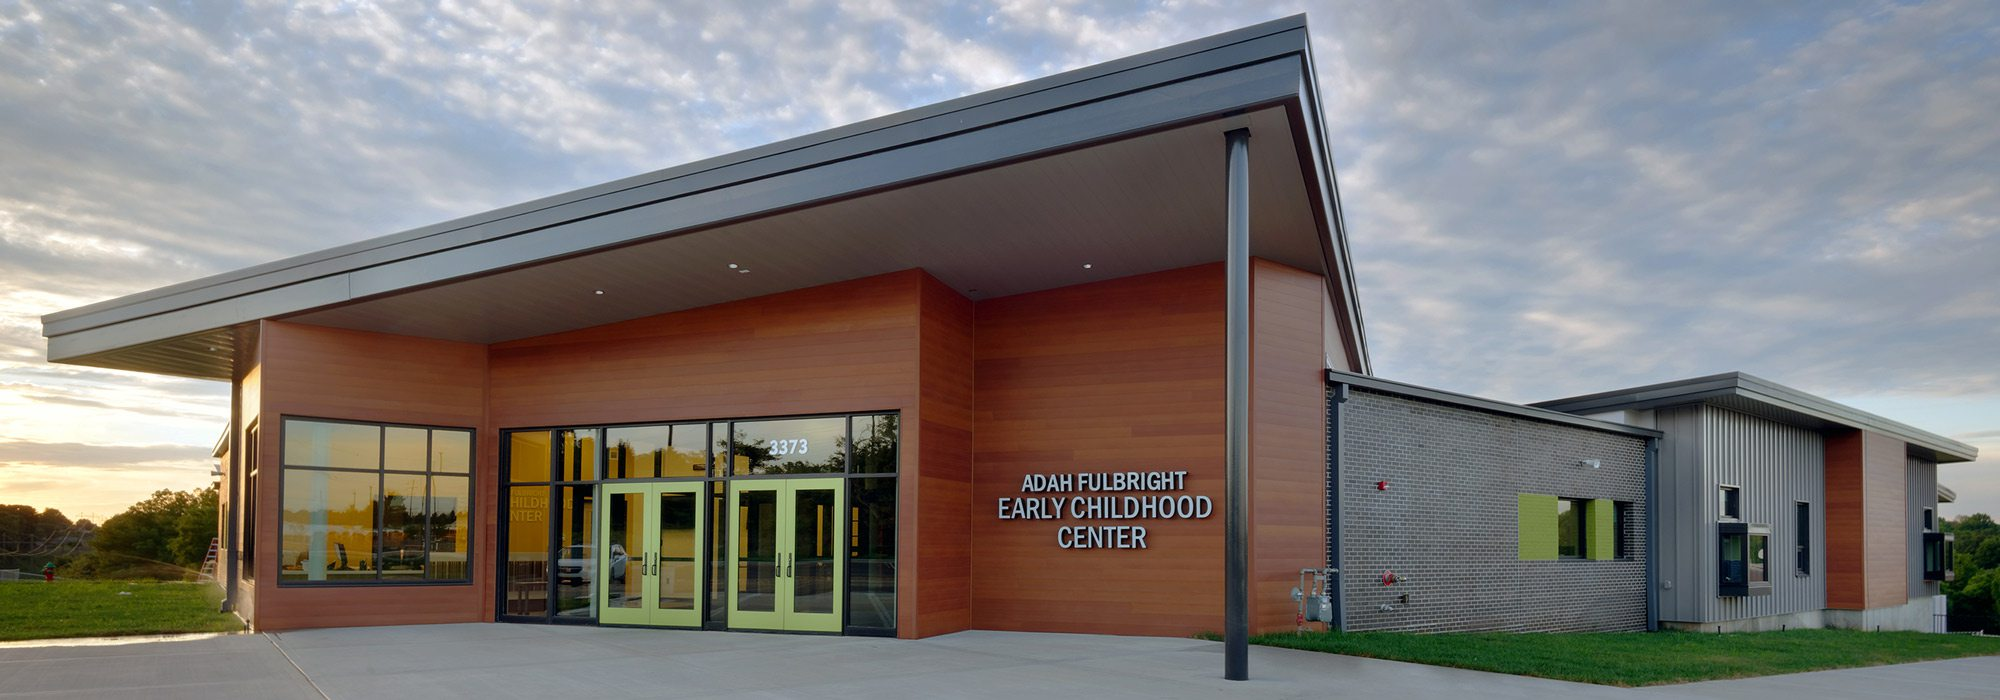 Adah Fulbright Center Exterior photo